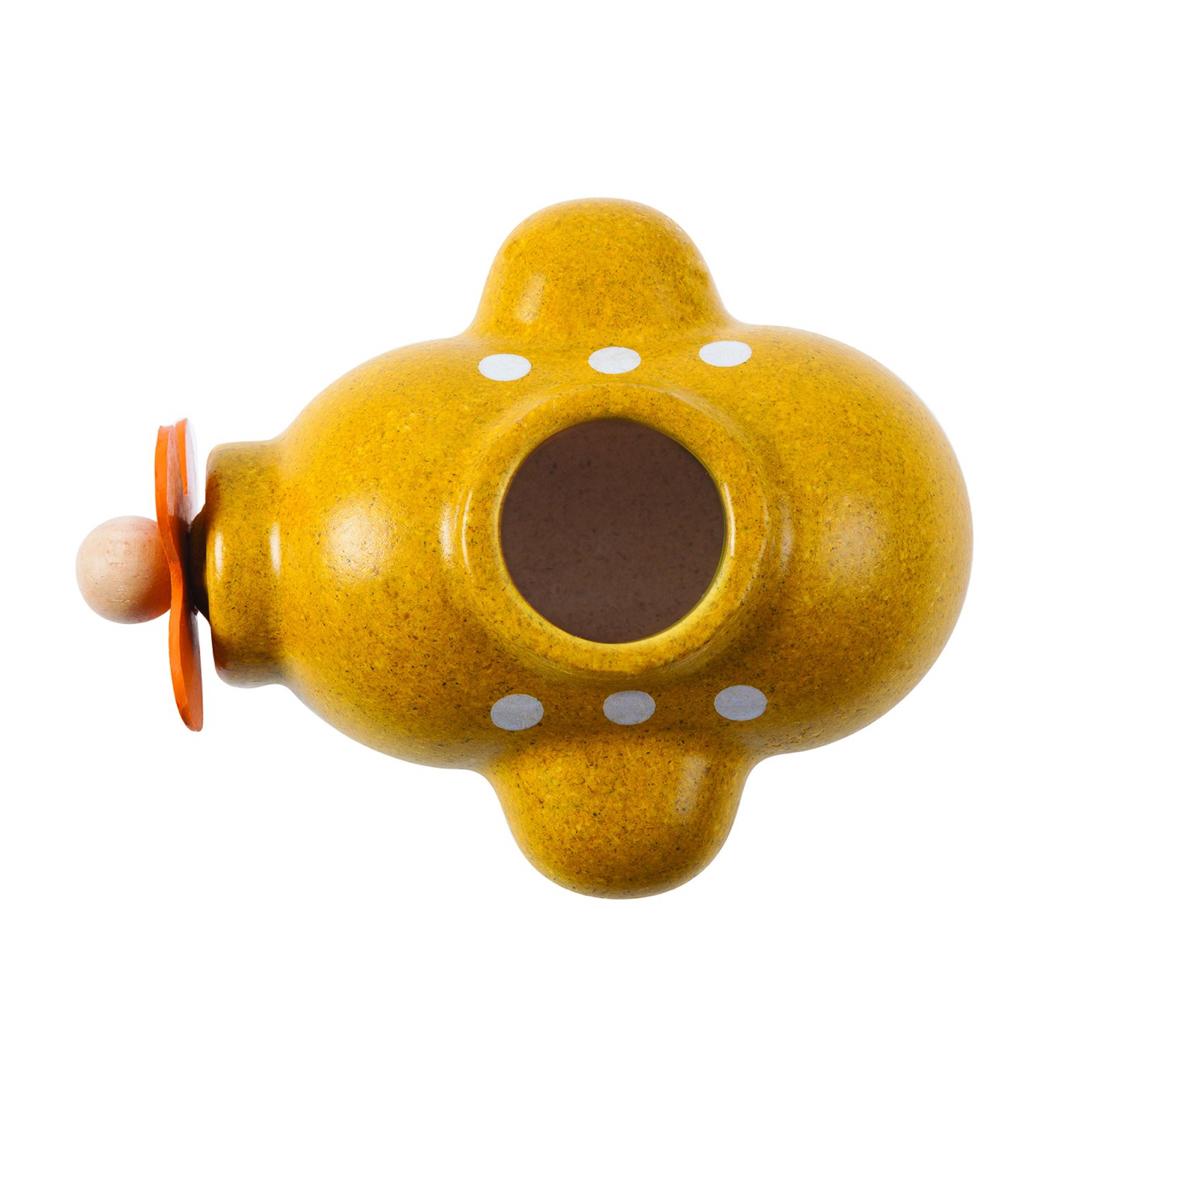 submarino-plantoys-el-mundo-de-mico